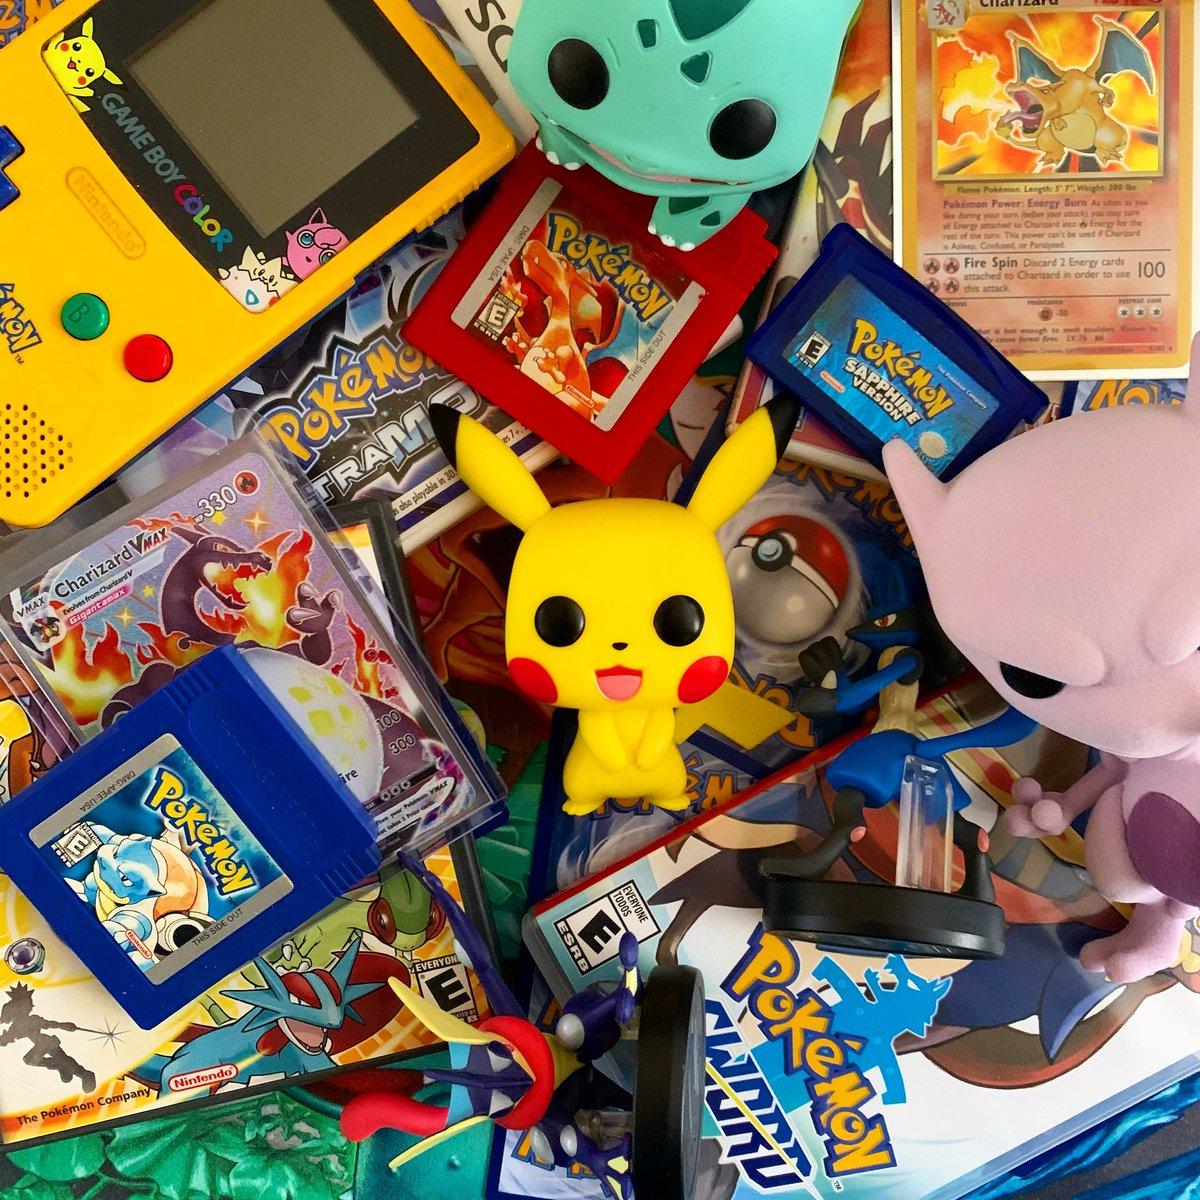 Happy Pokémon day!! I hope everyone is enjoying catching them all for 25 years!! @Pokemon @OriginalFunko #PokemonDay